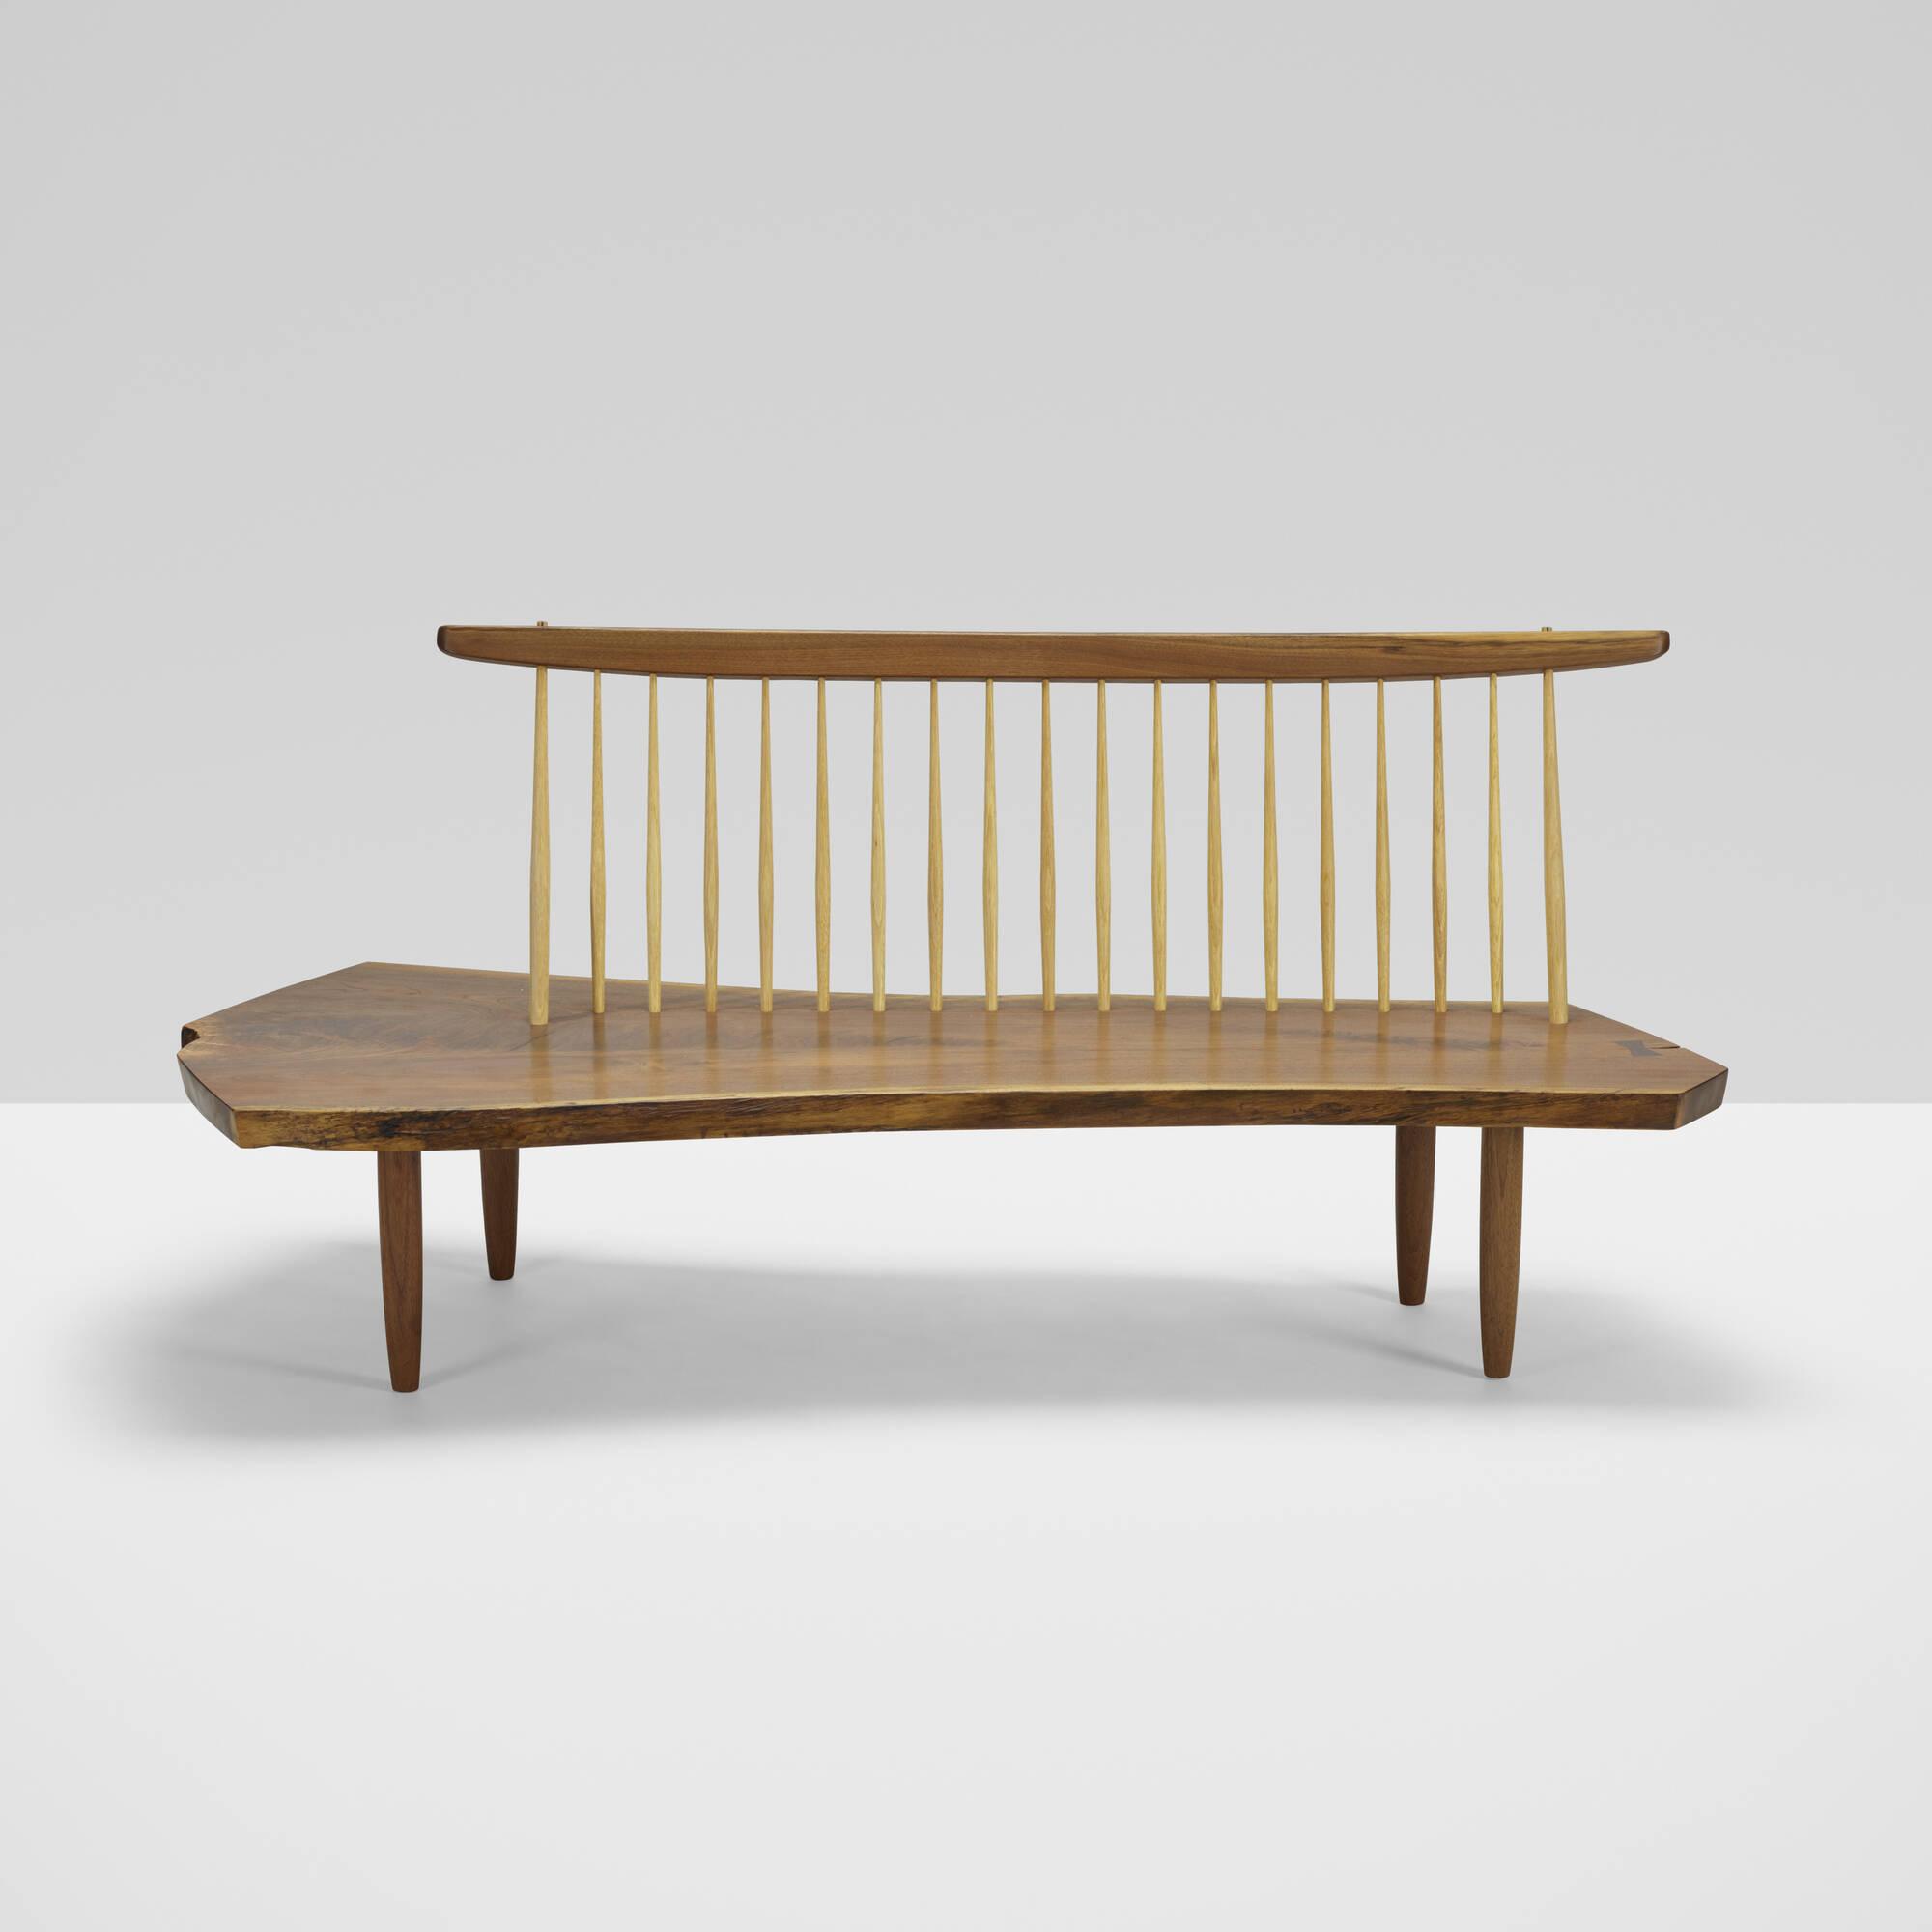 173: Mira Nakashima / Conoid bench (2 of 3)